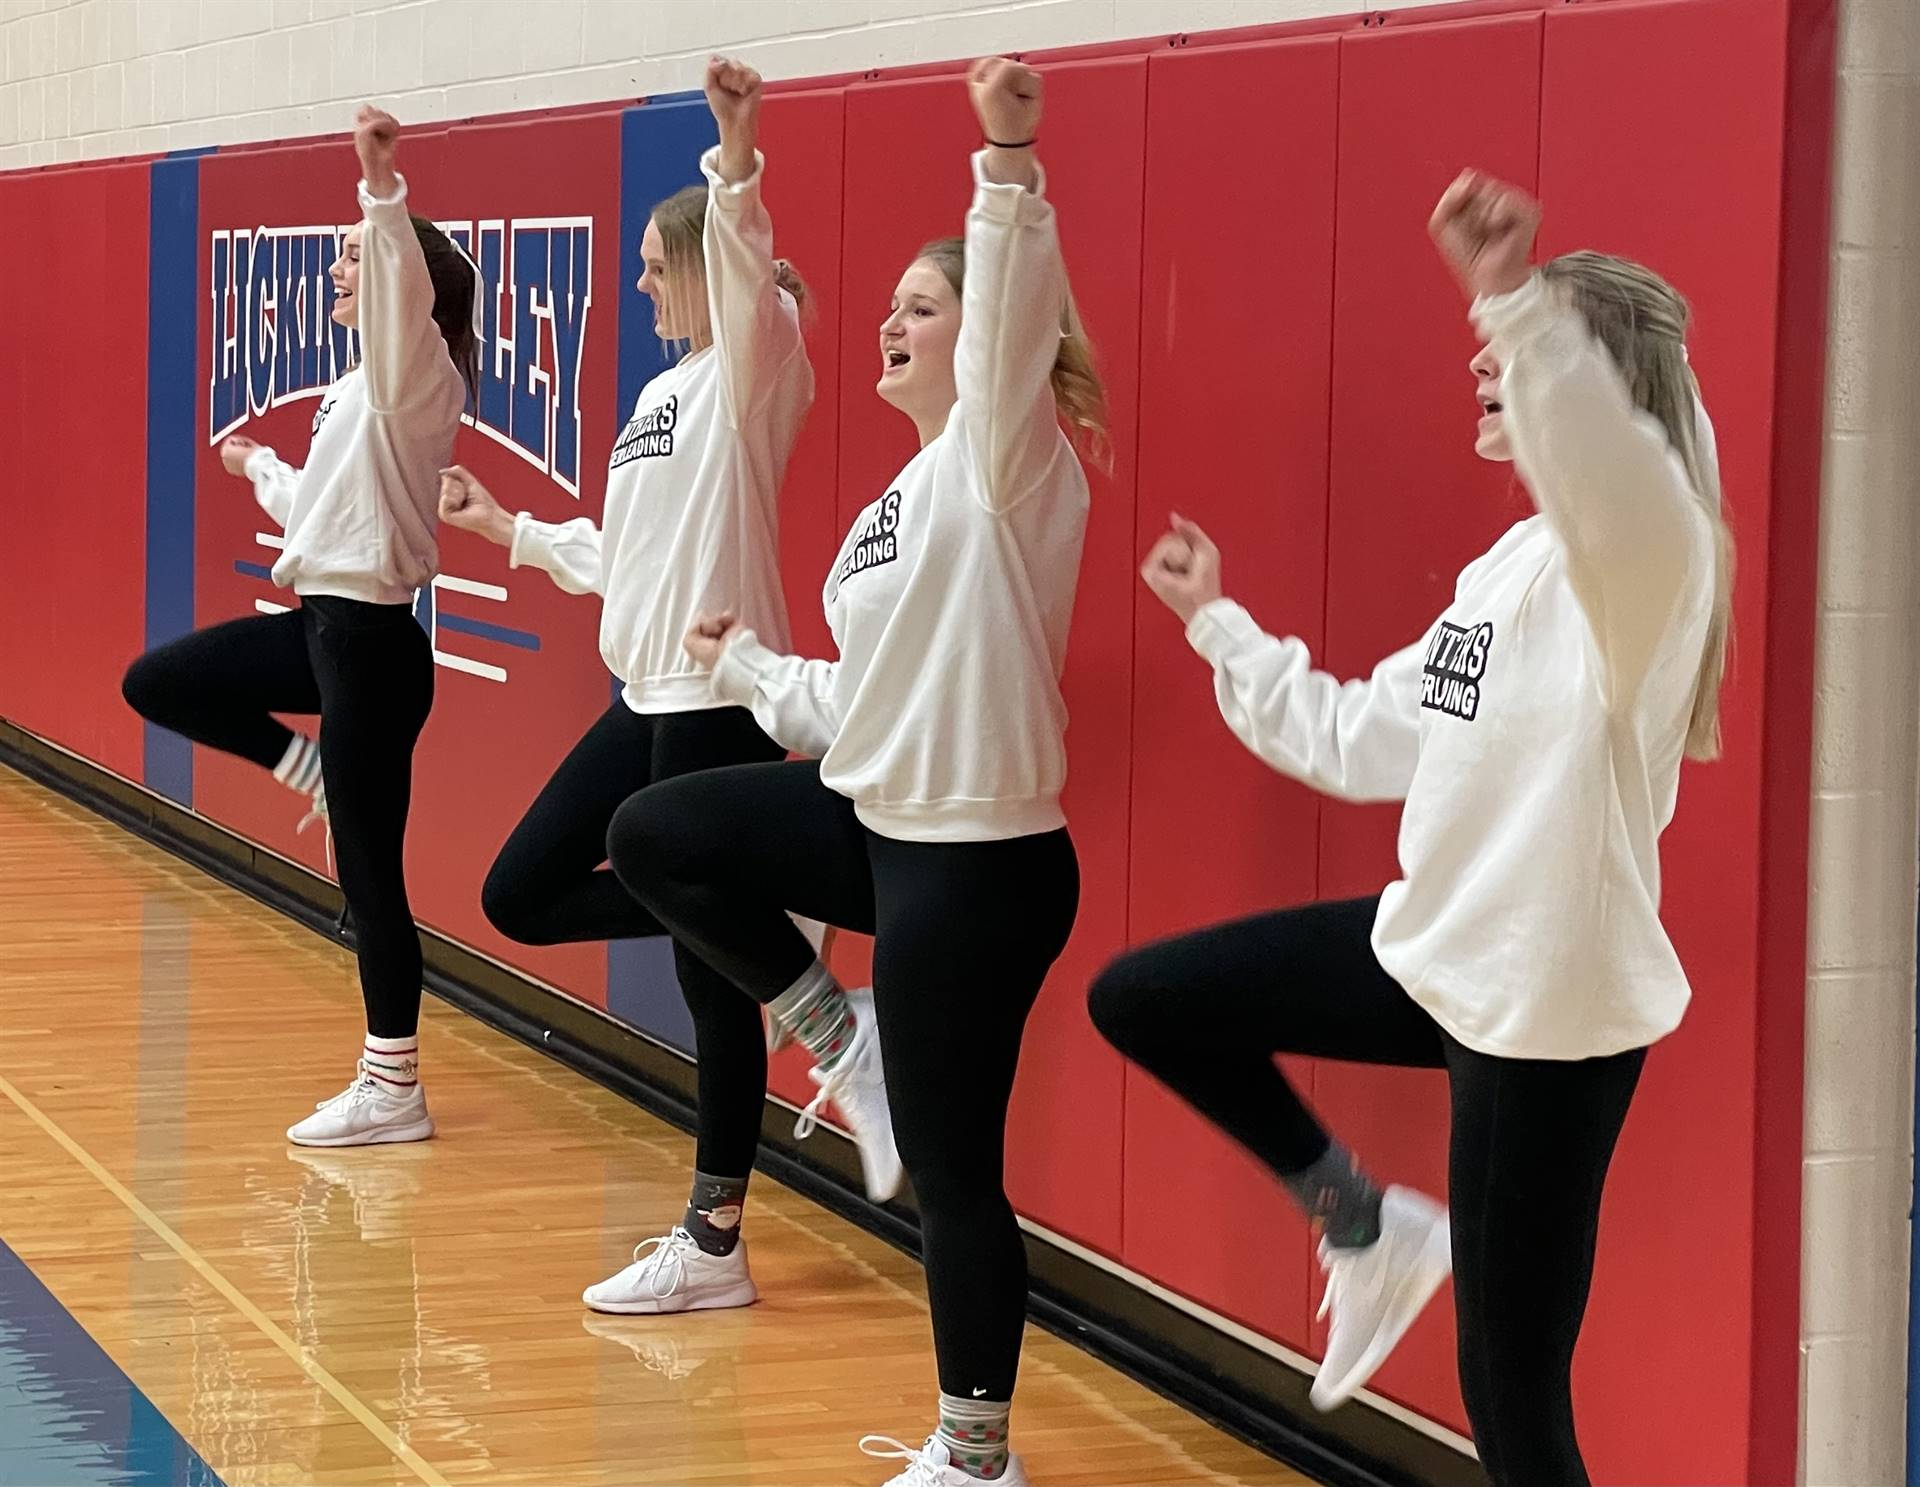 Varsity Cheerleaders at Licking Valley